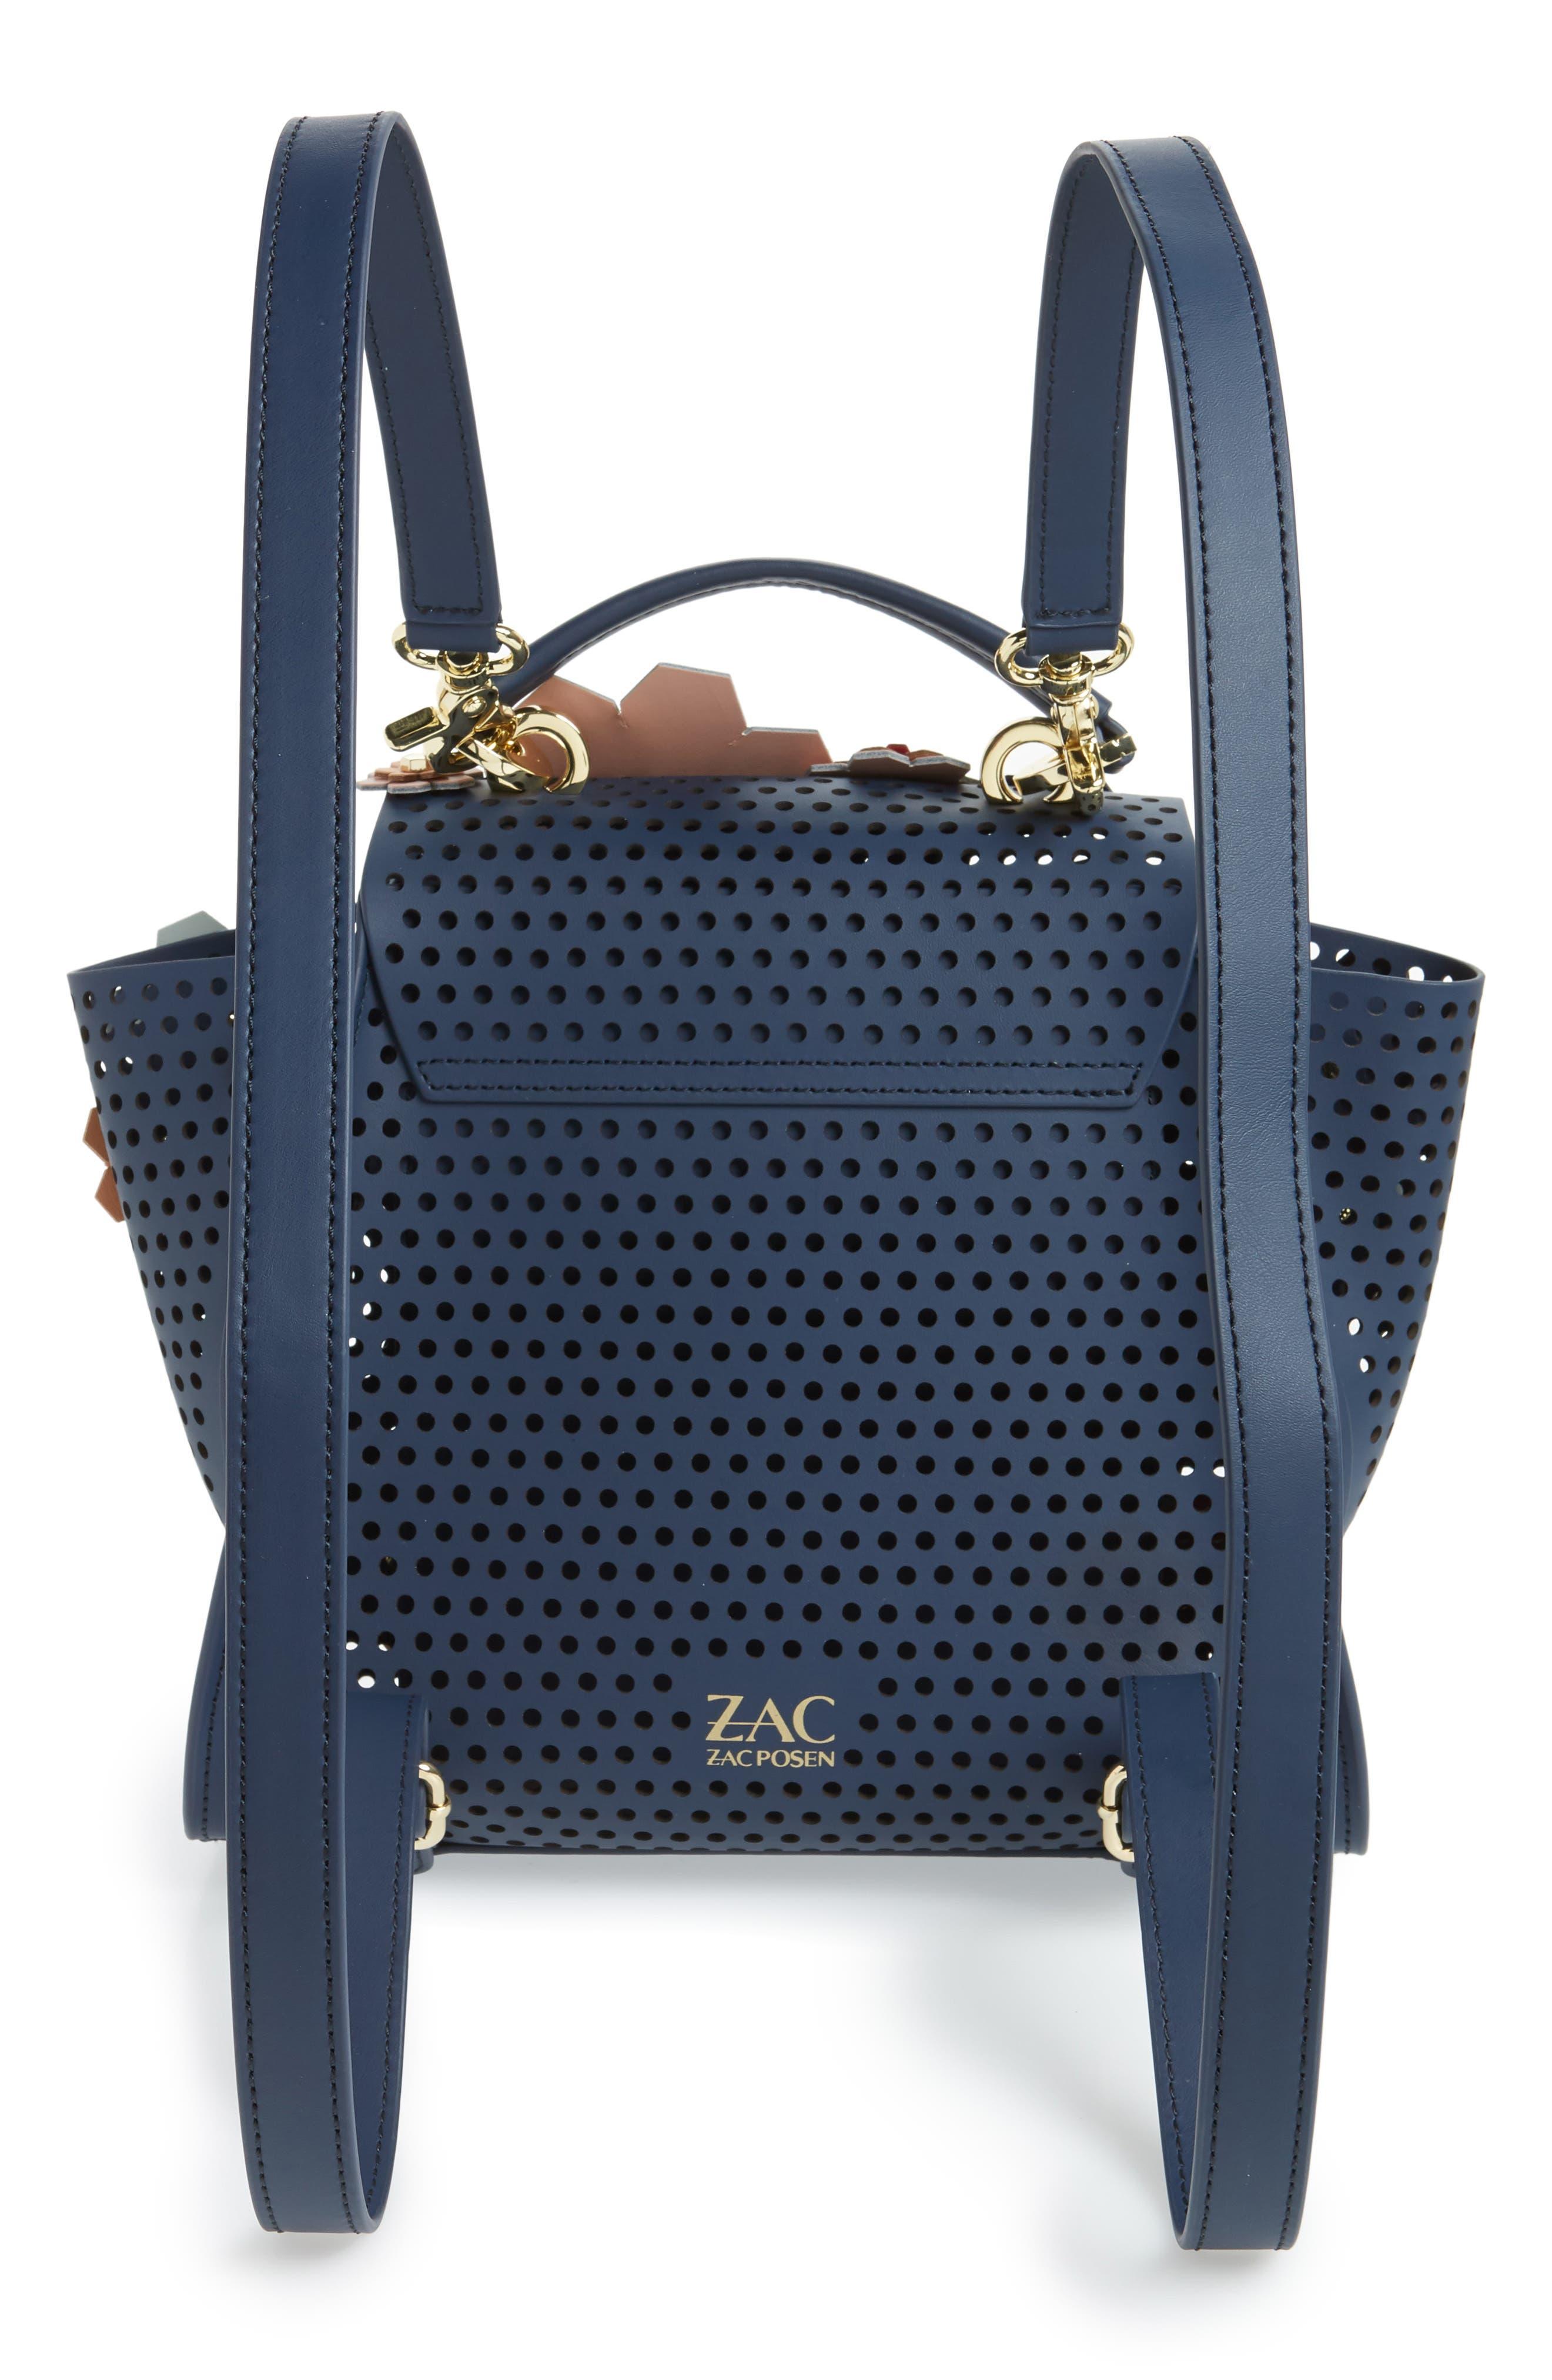 Eartha Kit Convertible Calfskin Leather Backpack,                             Alternate thumbnail 3, color,                             Blue/ Rainbow